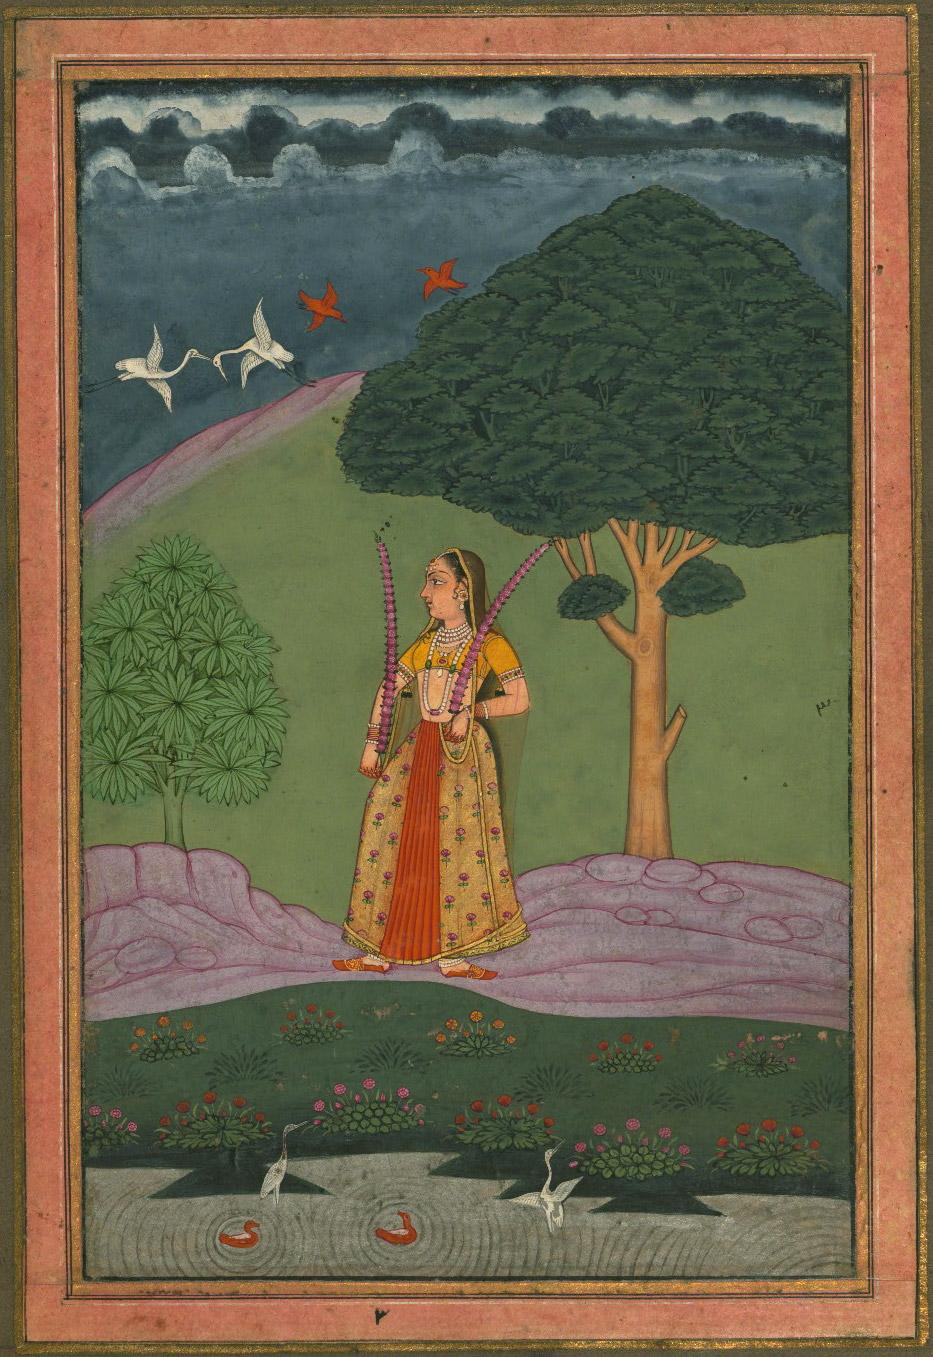 Gauri Ragini - Miniature Painting, Deccan School, Ragamala Series, 19th Century